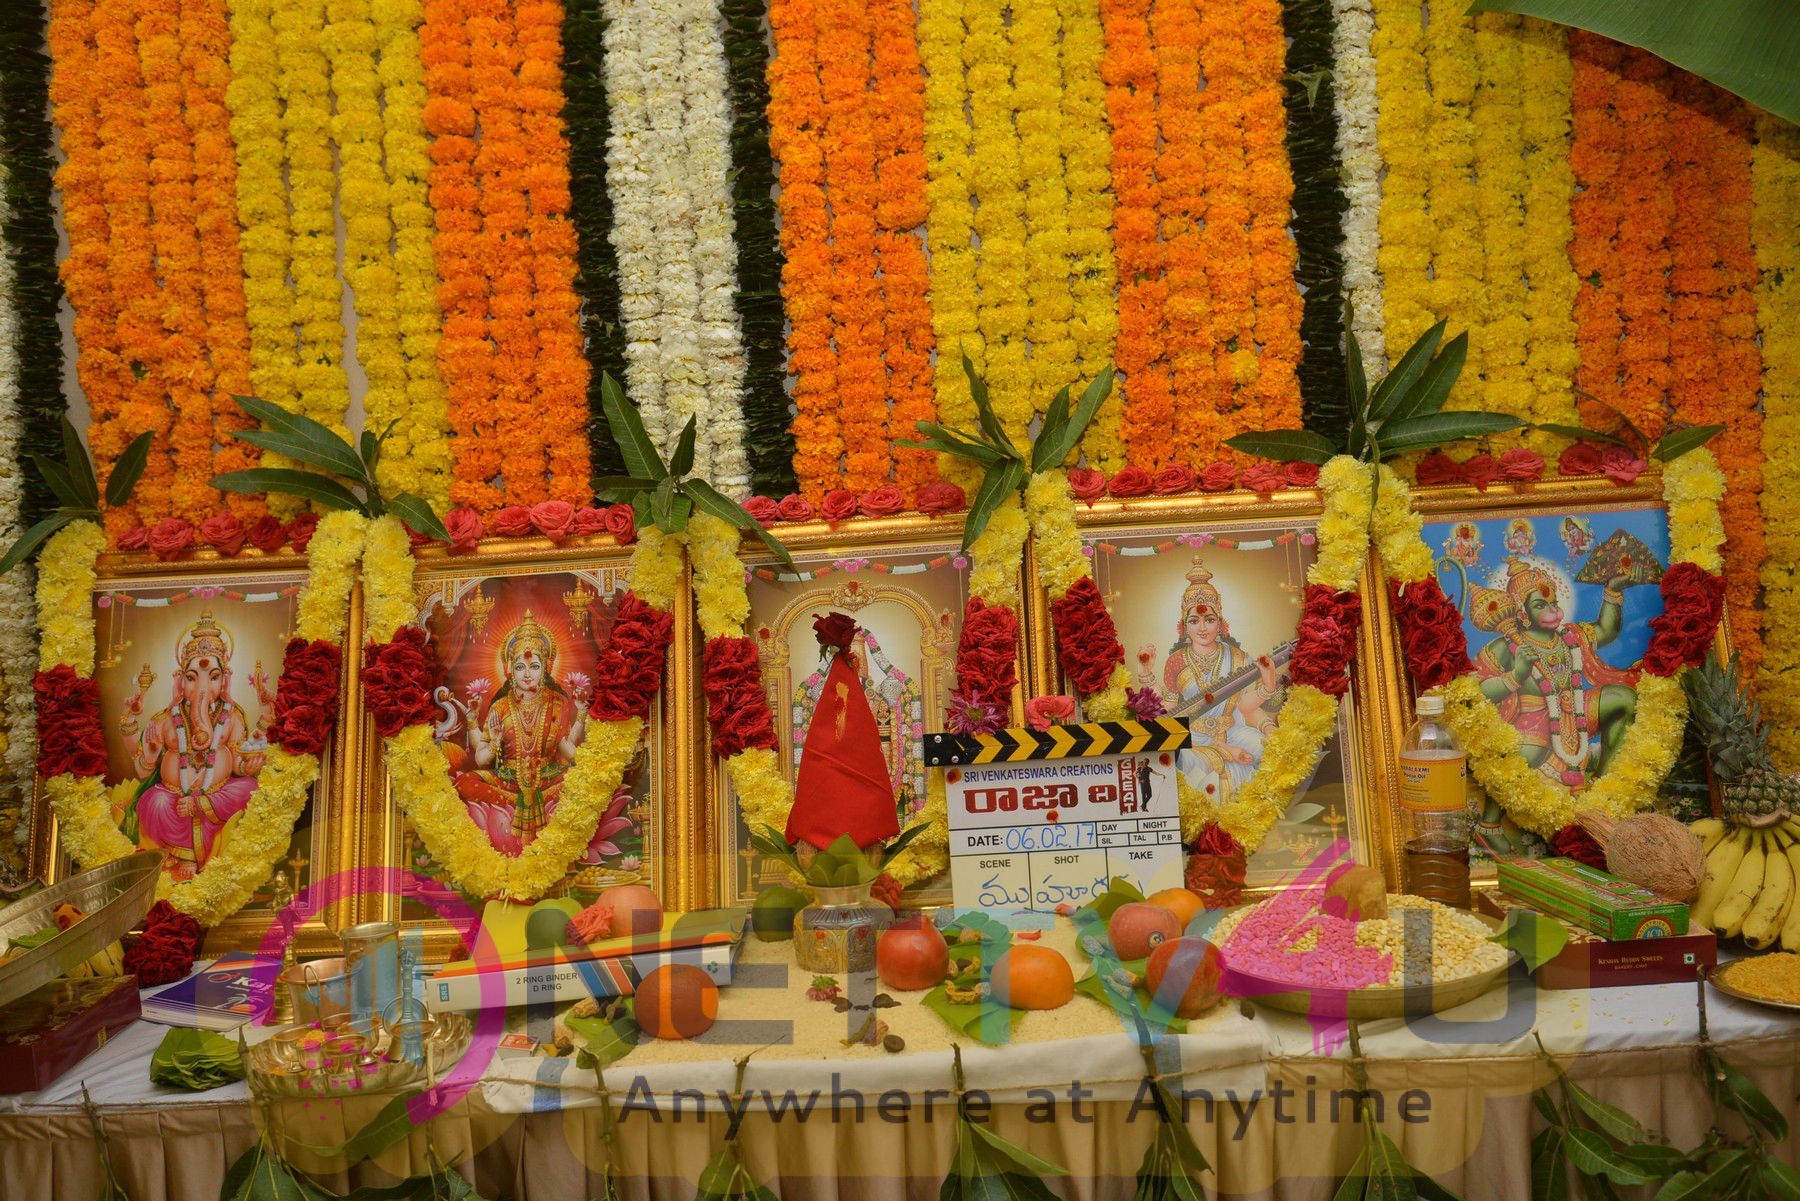 Vibrant Photos Of Ravi Teja's Raja The Great Movie Pooja Ceremony